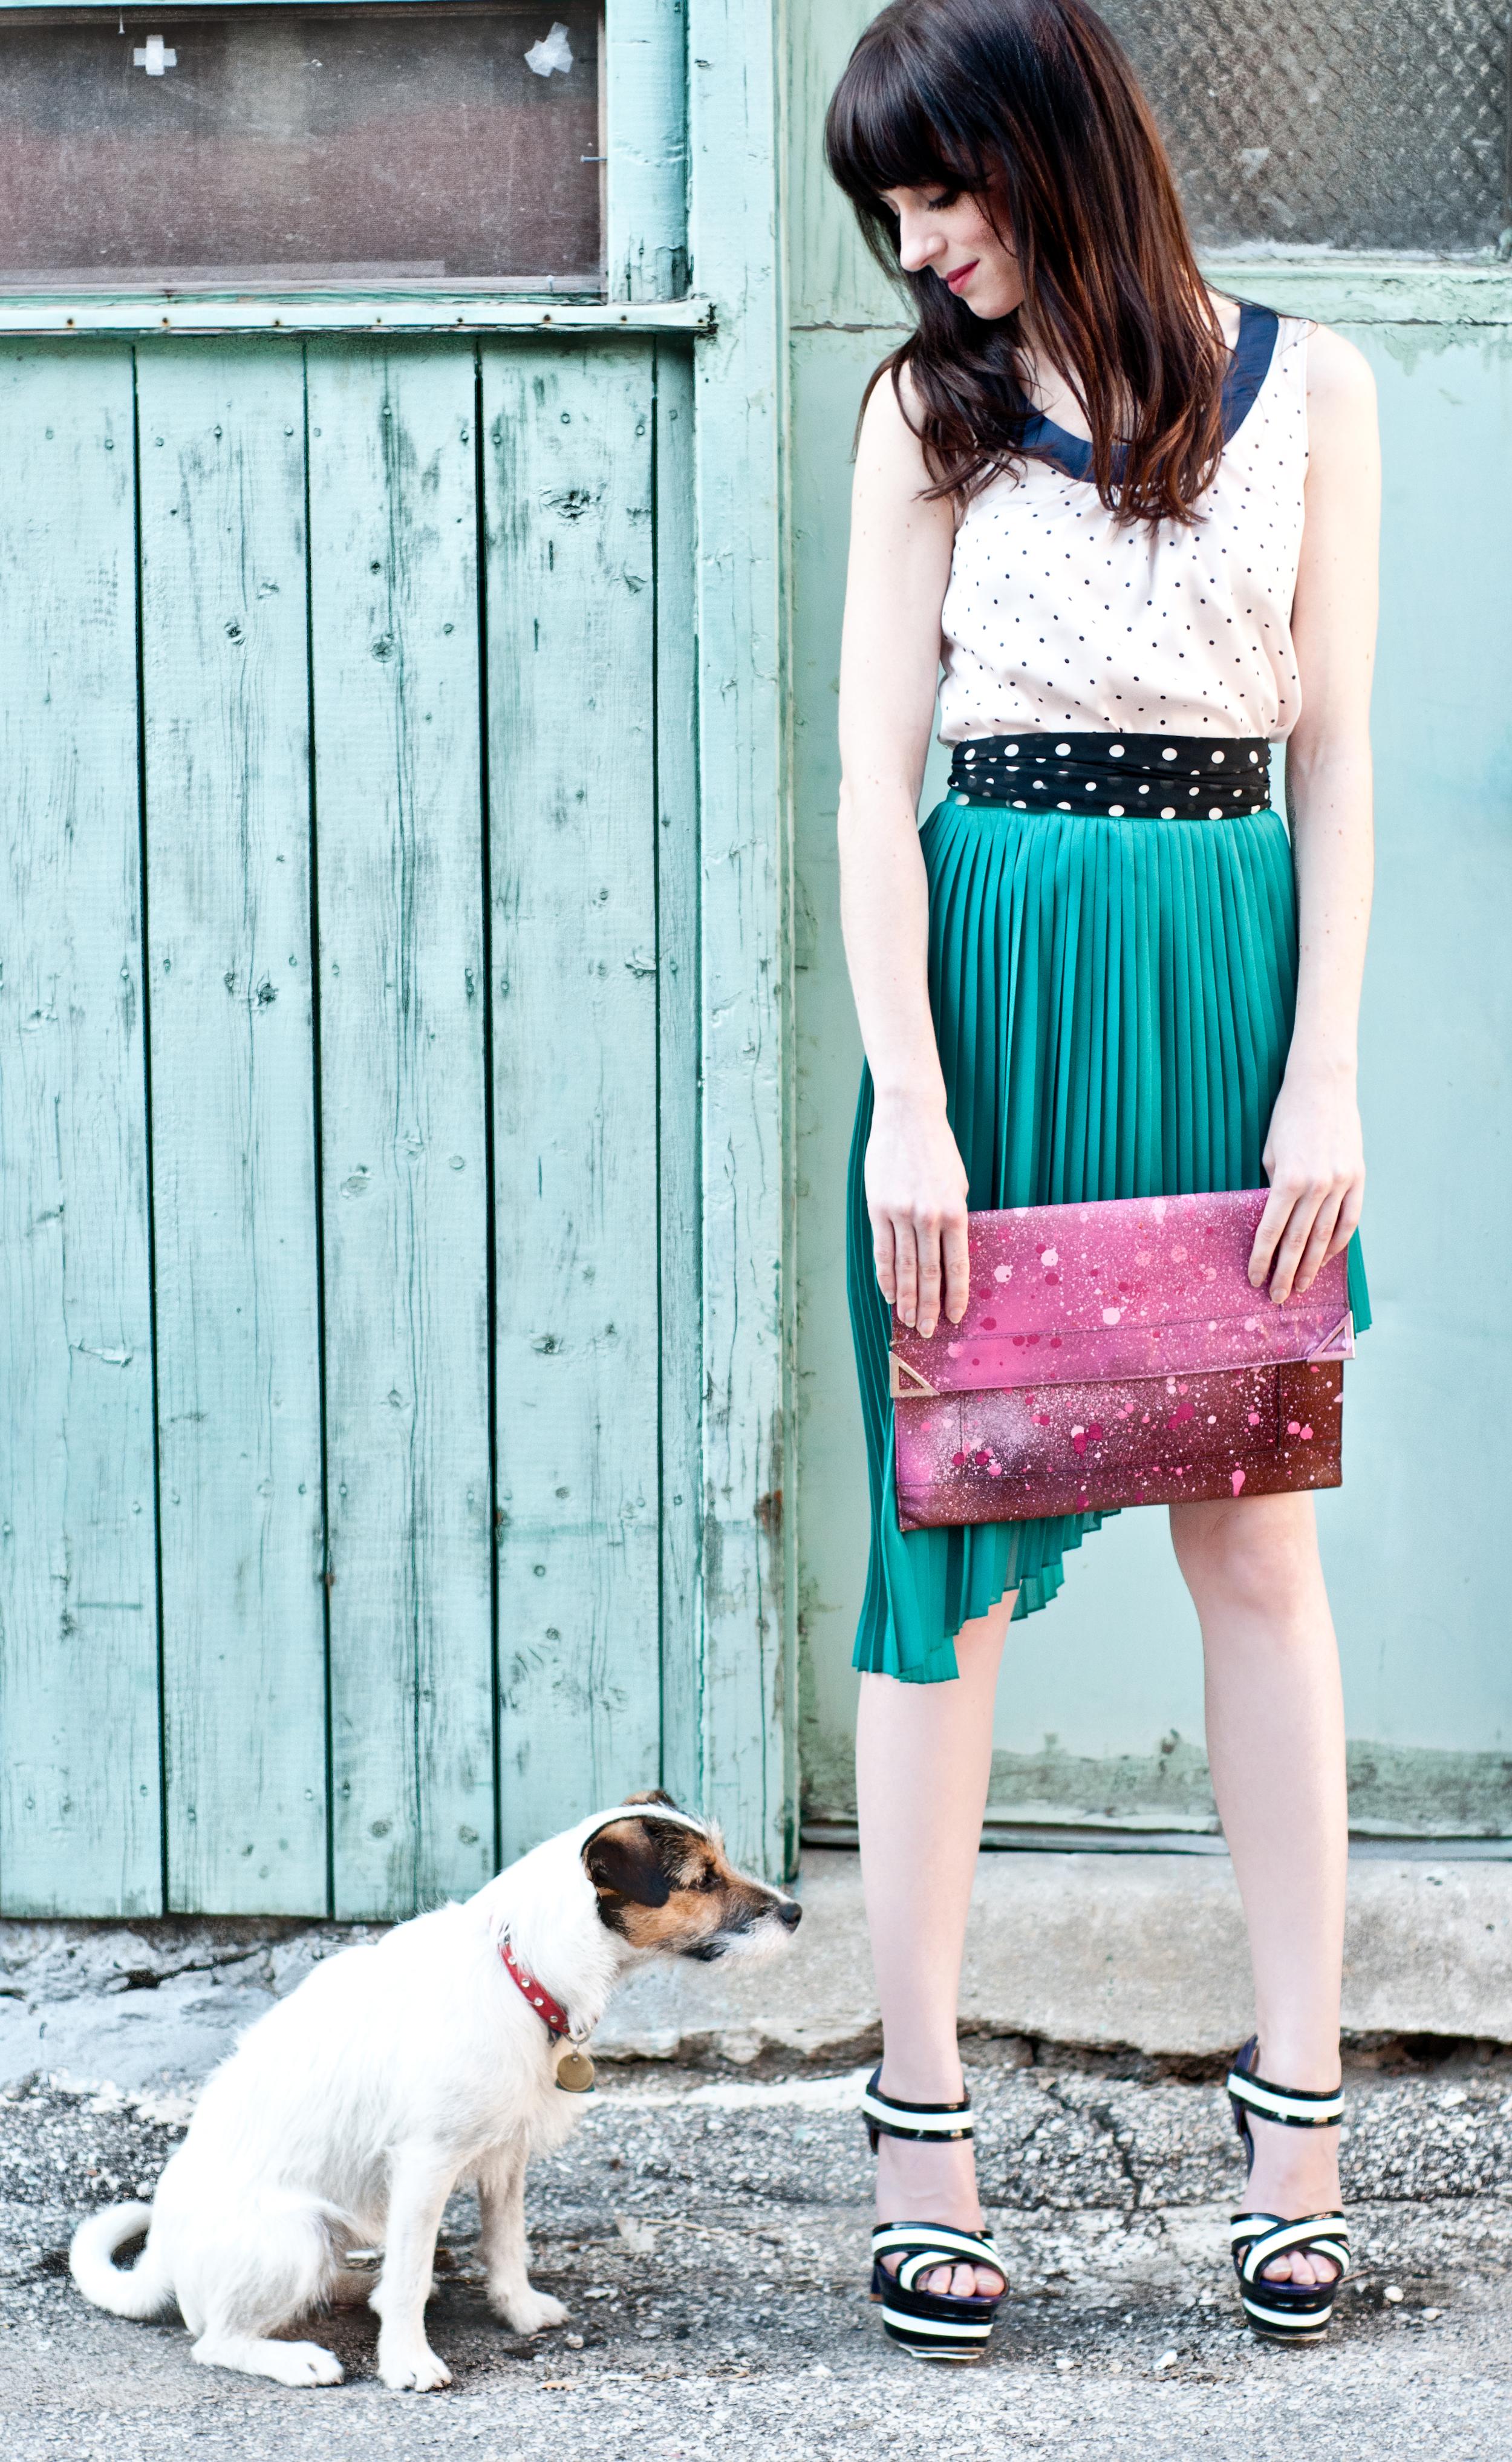 Dyane Campbell - Fashion Shoot 2012- Jessica Olsen-1055.jpg